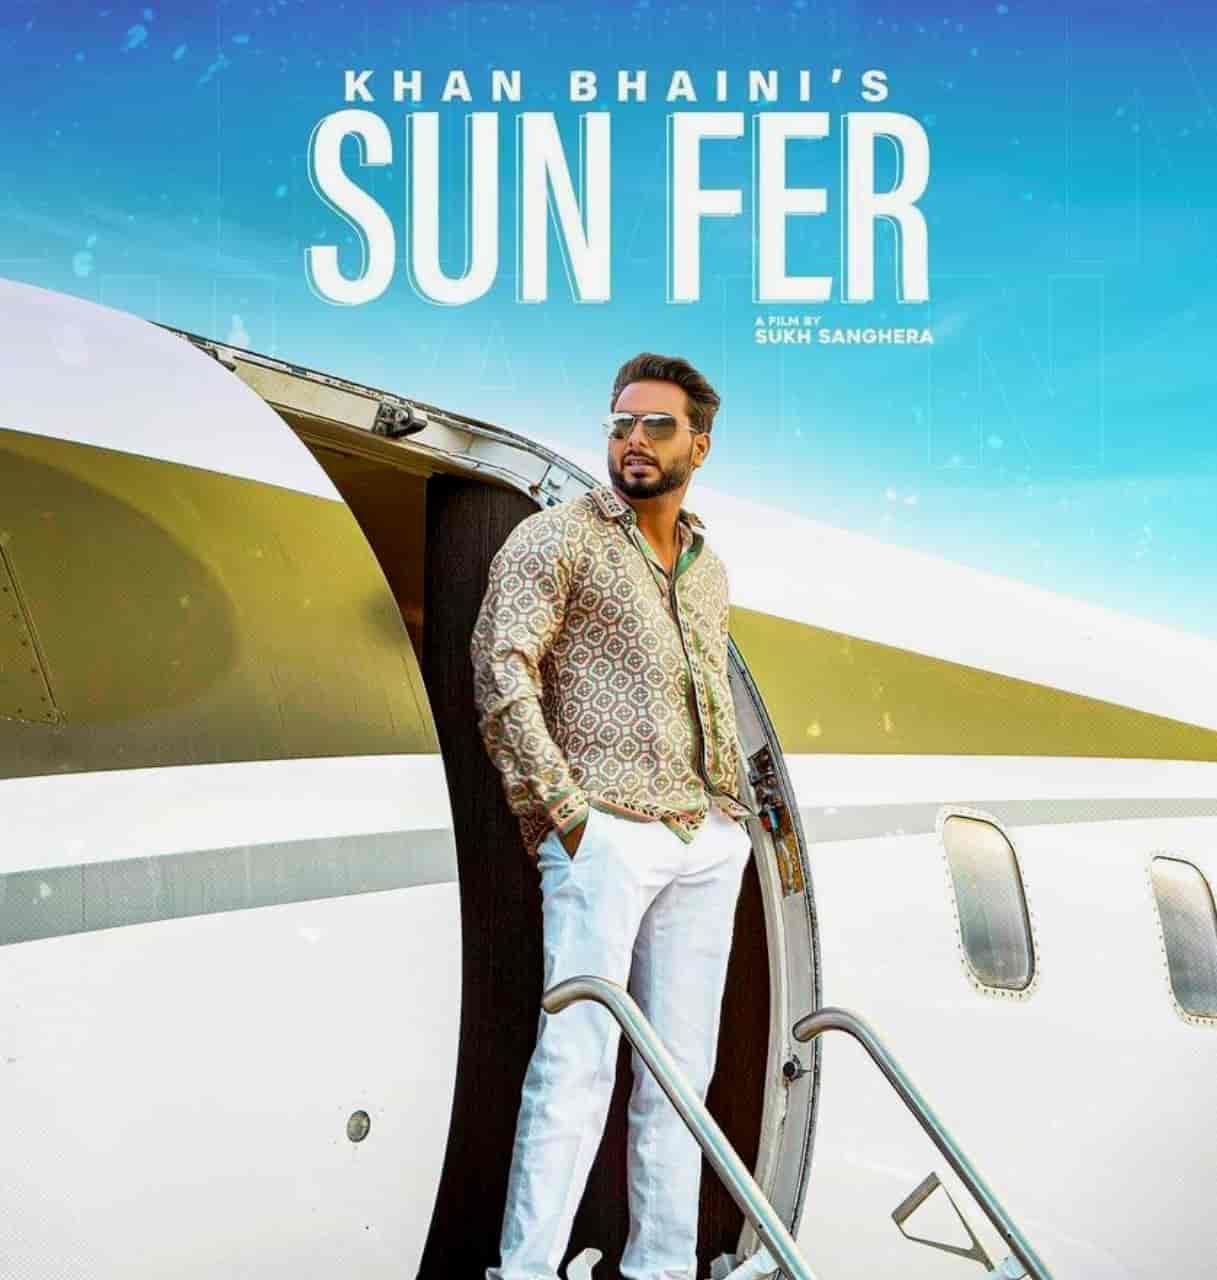 sun fer by khan bhaini mp3 download